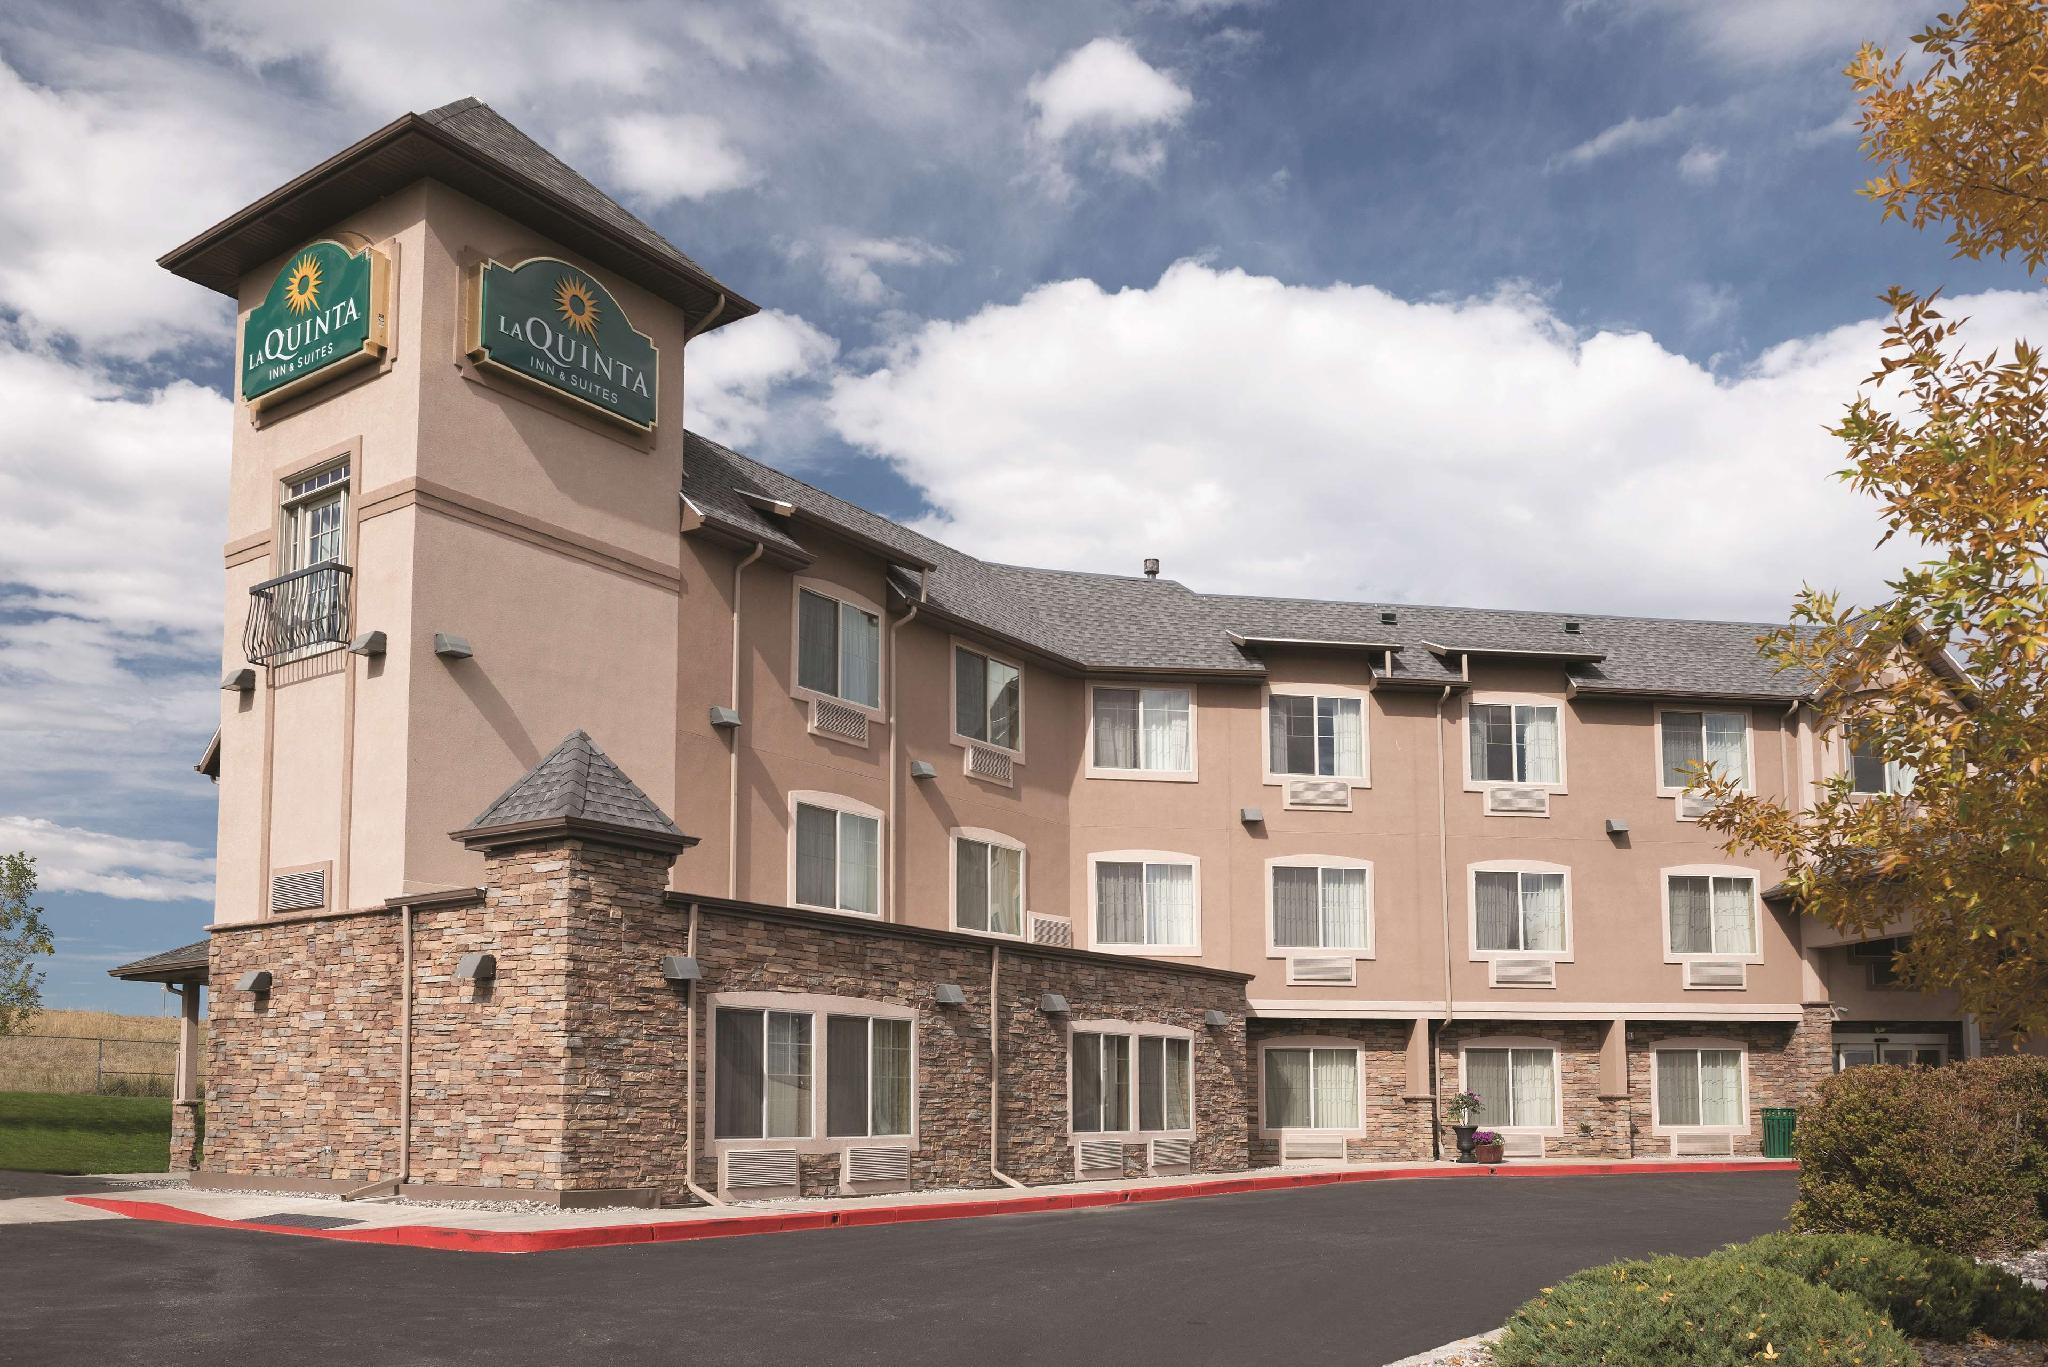 La Quinta Inn And Suites By Wyndham Bozeman